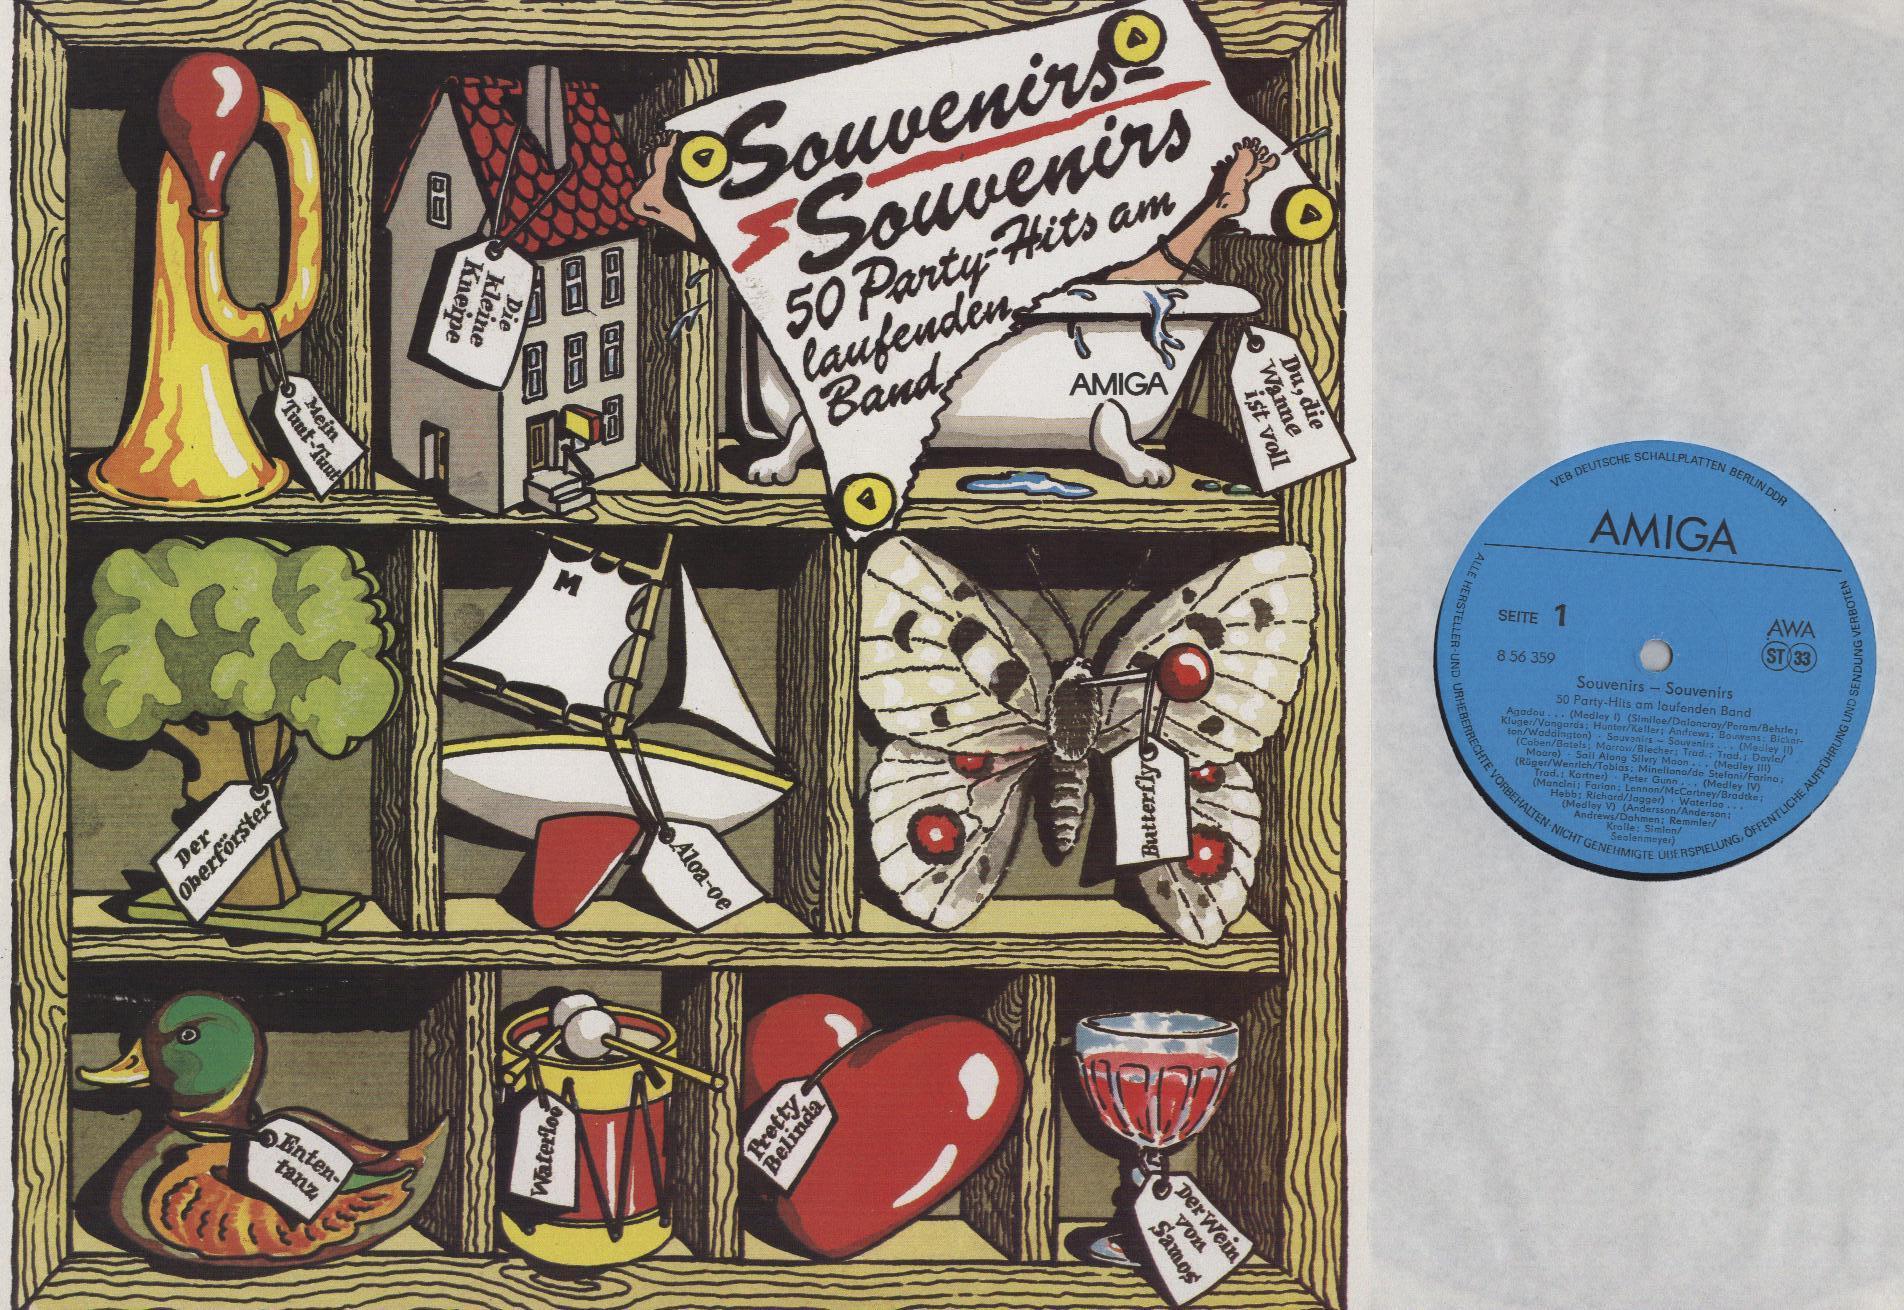 Lothar Kehr Mit Chor Und Orchester Allotria - Souvenirs-Souvenirs 50 Party-Hits Am Laufenden Band - 33T